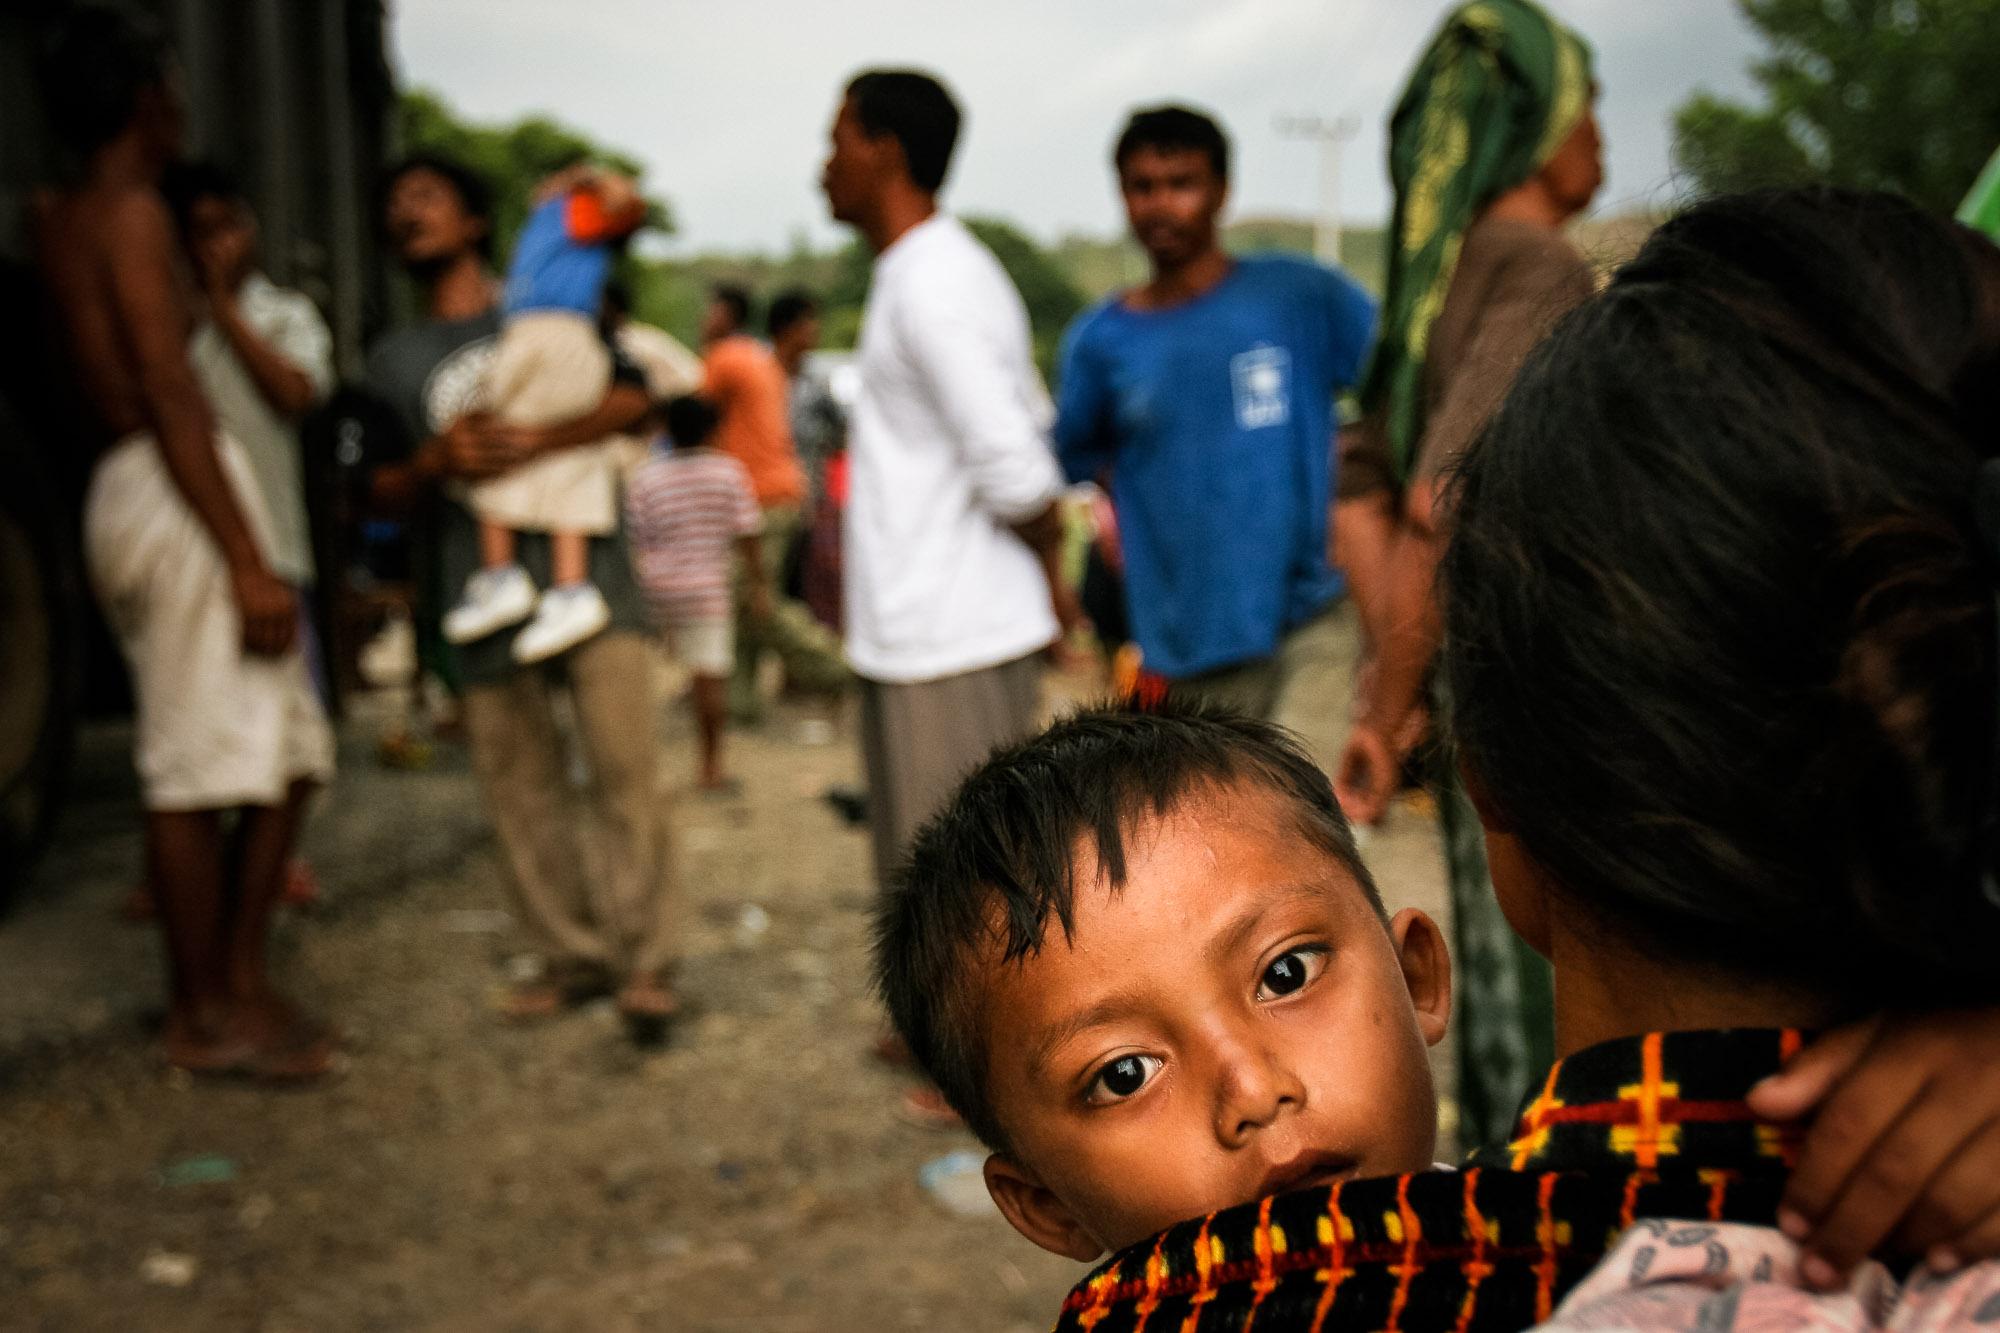 UN, IOM, UNHCR - DISASTER RELIEF(GRAPHIC CONTENT)